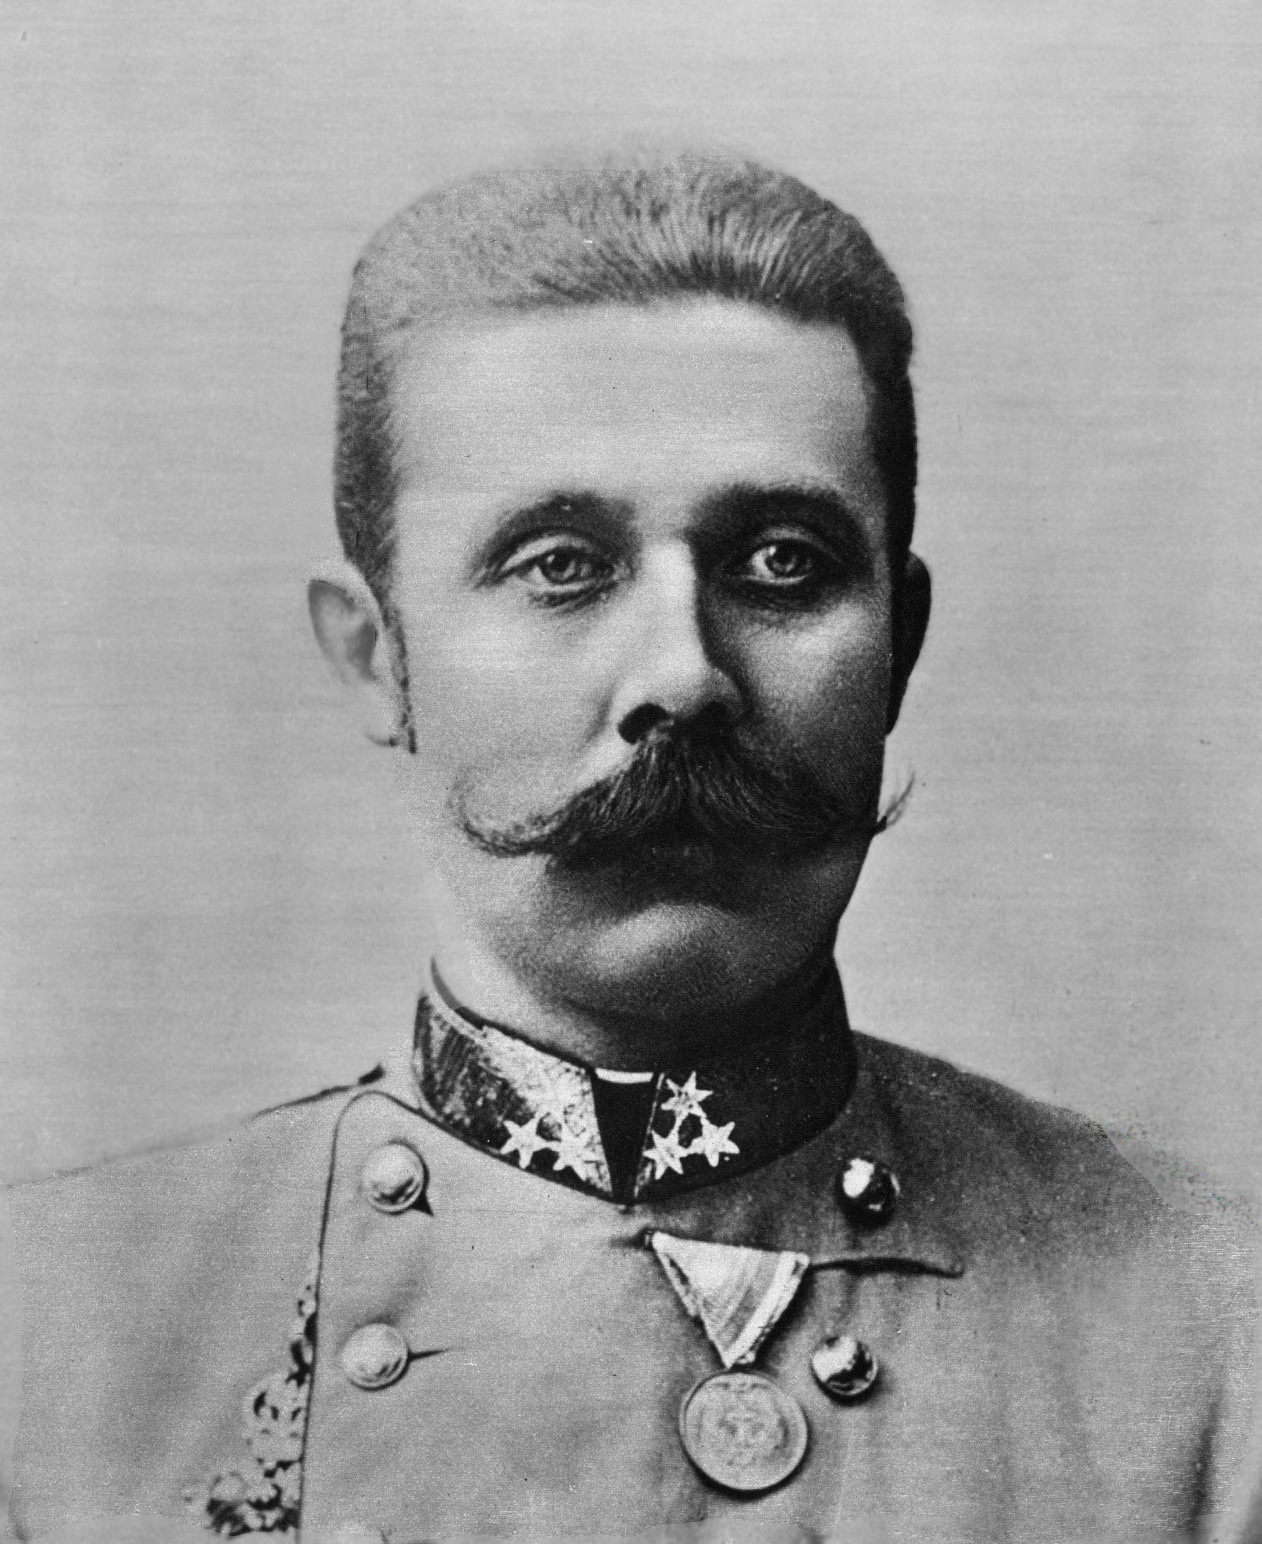 File:Franz ferdinand bw.jpg